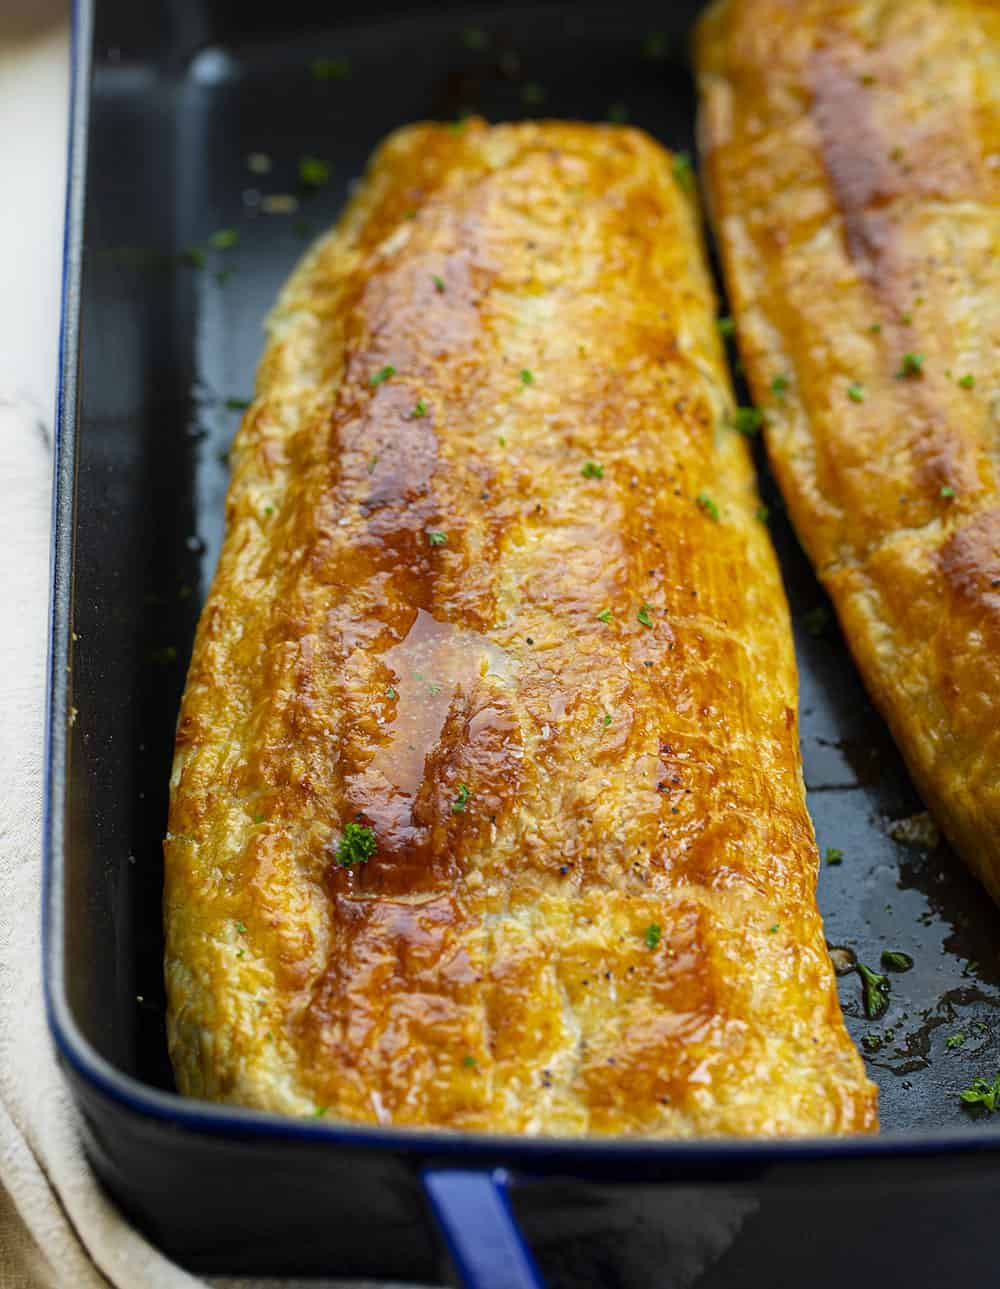 Puff Pastry Zucchini Boat in a Casserole Pan